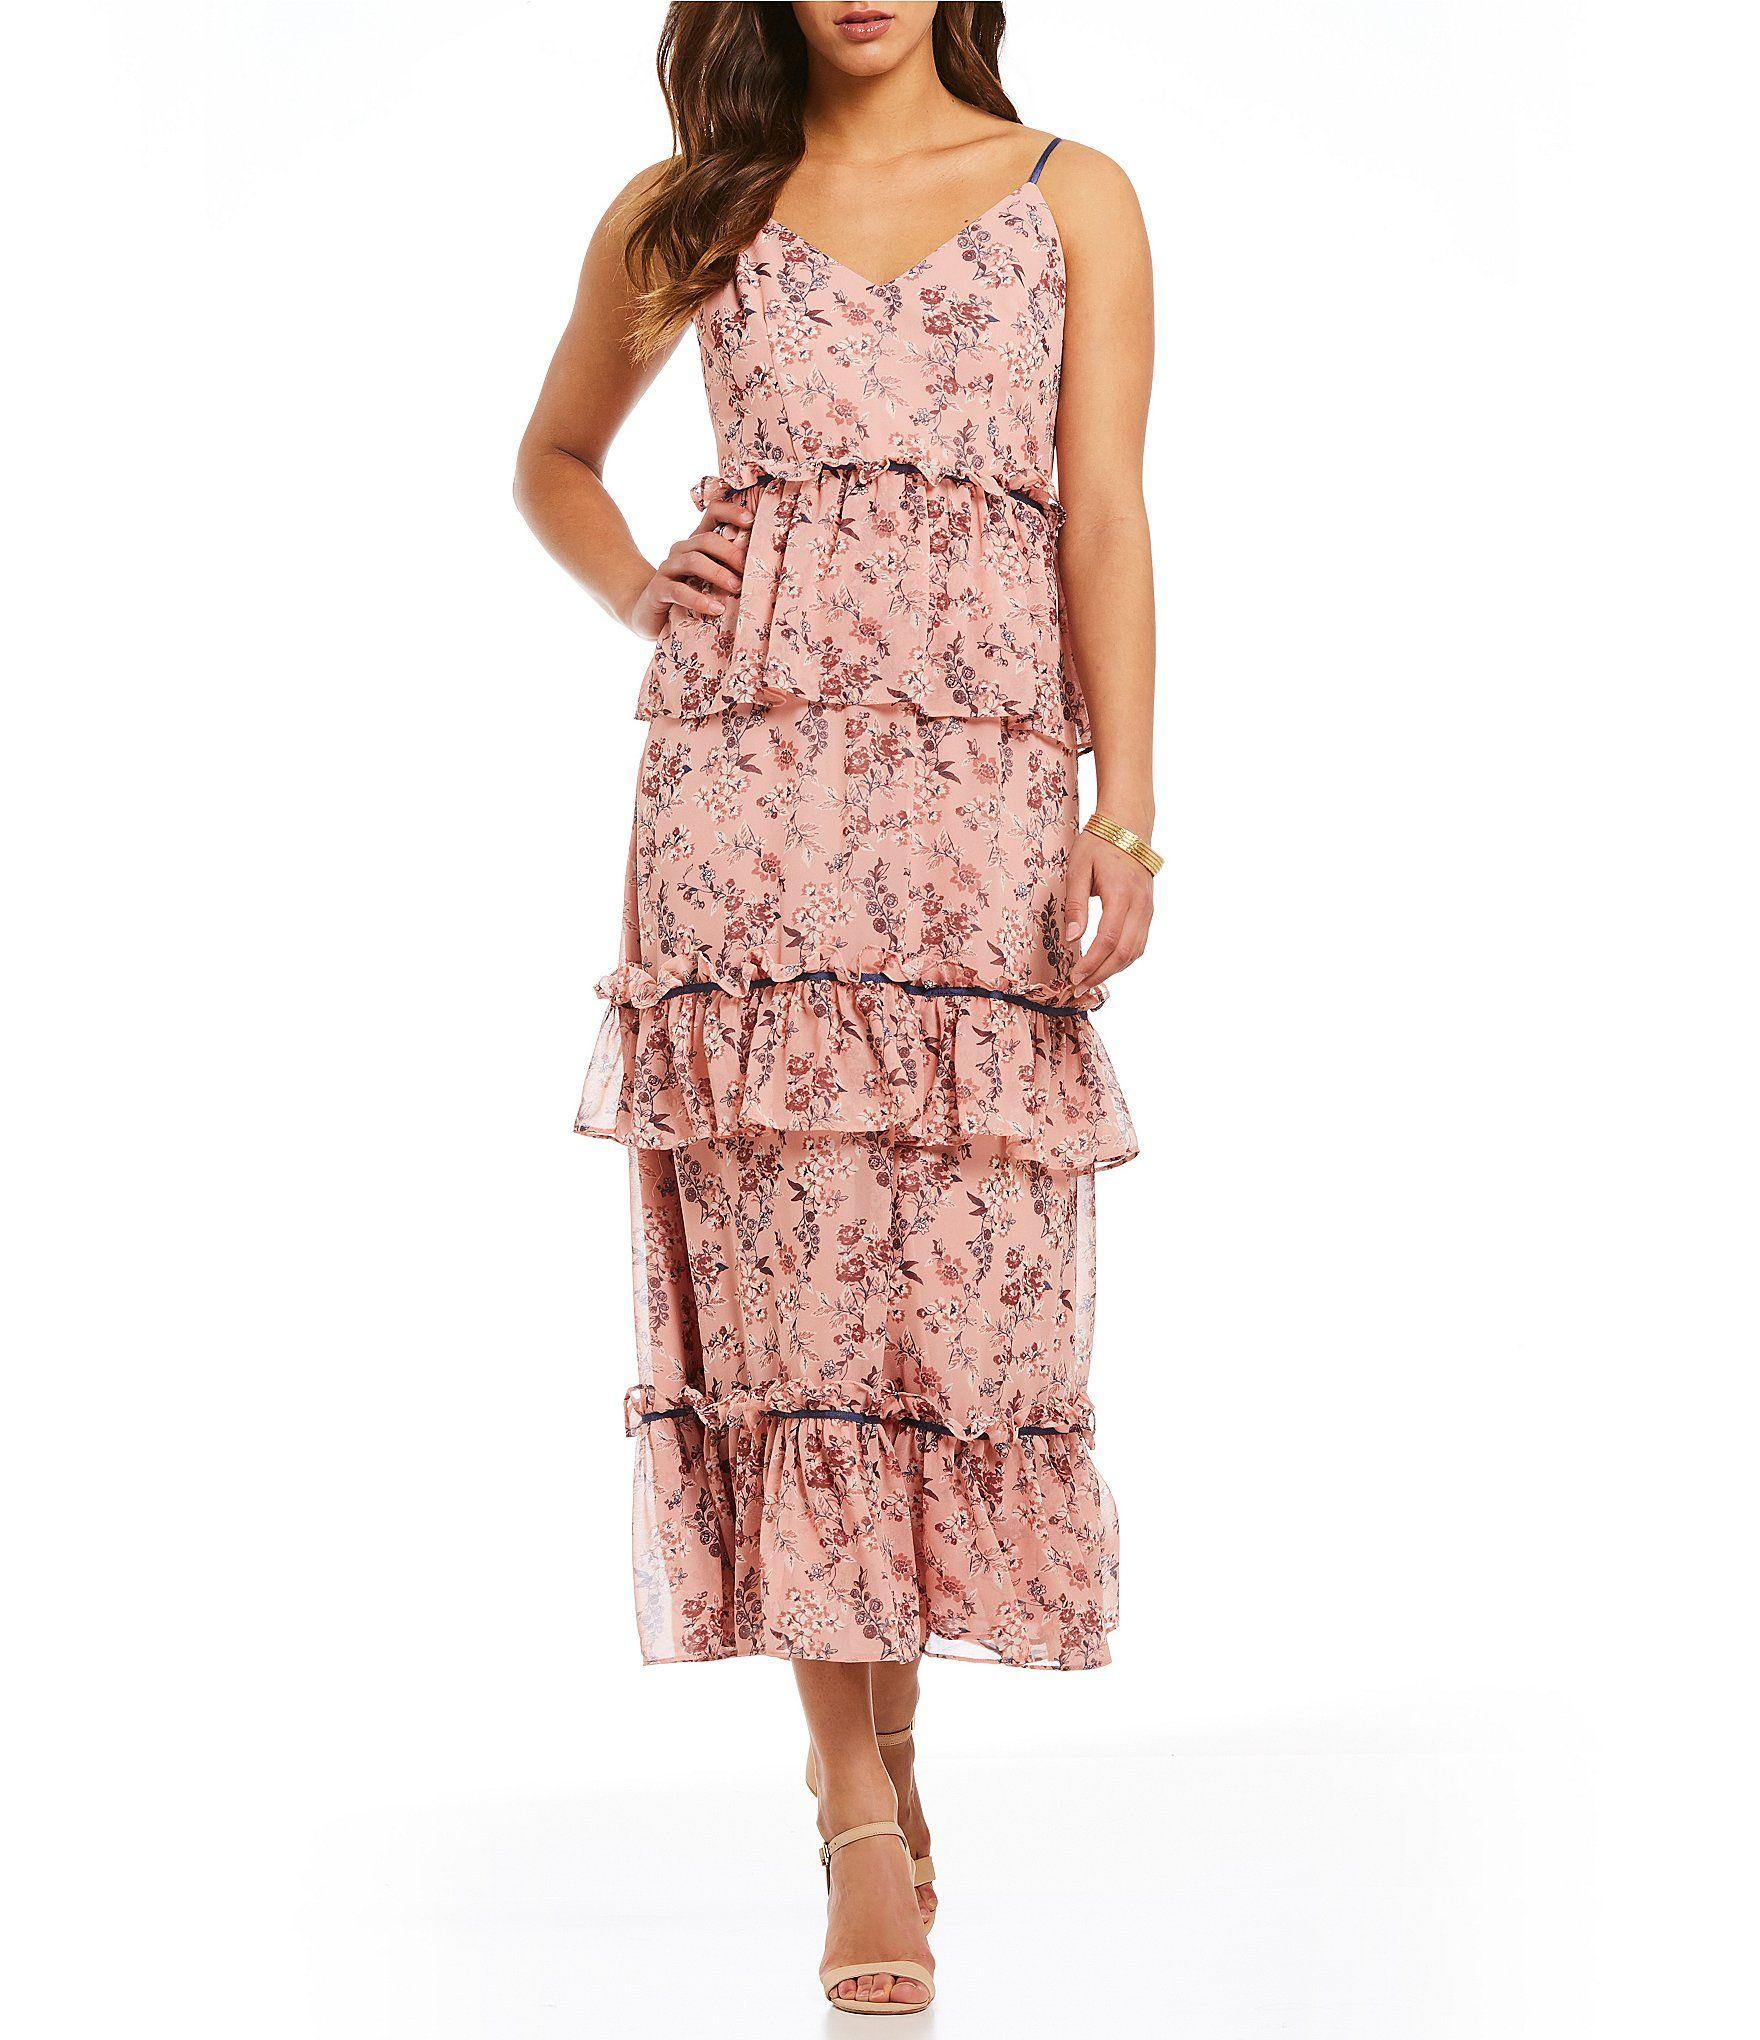 Wedding dresses dillards  Gianni Bini Steph Ditsy Floral Print Victorian Tiered Ruffle Midi